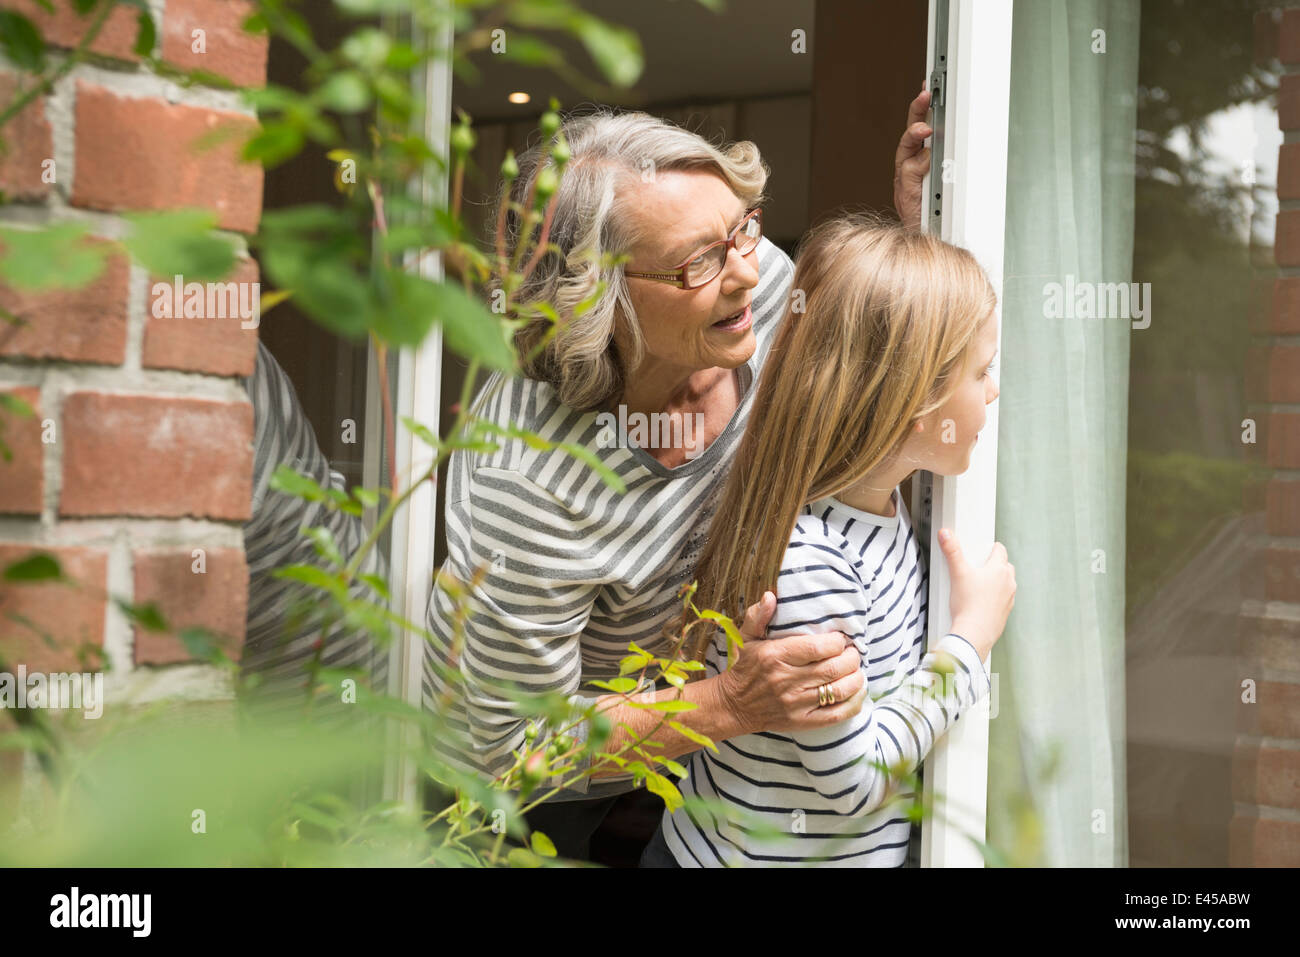 Grandmother and granddaughter bonding - Stock Image